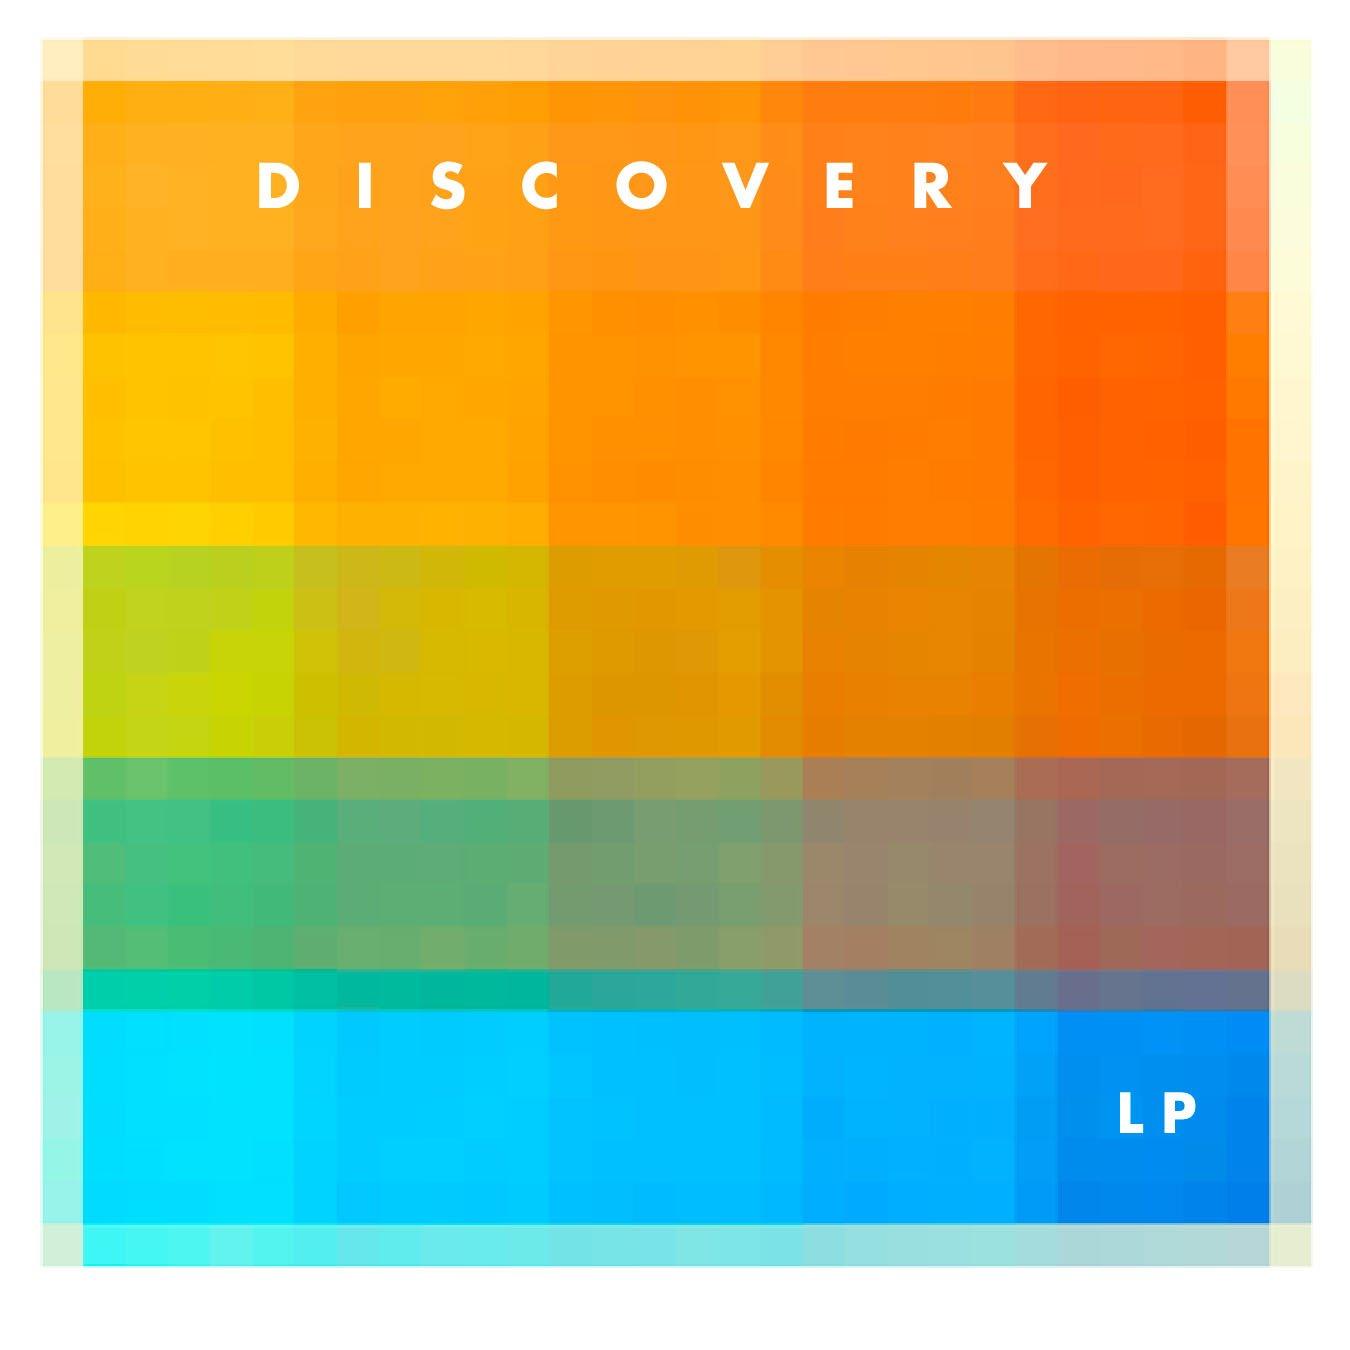 LP [Vinyl] by XL Recordings